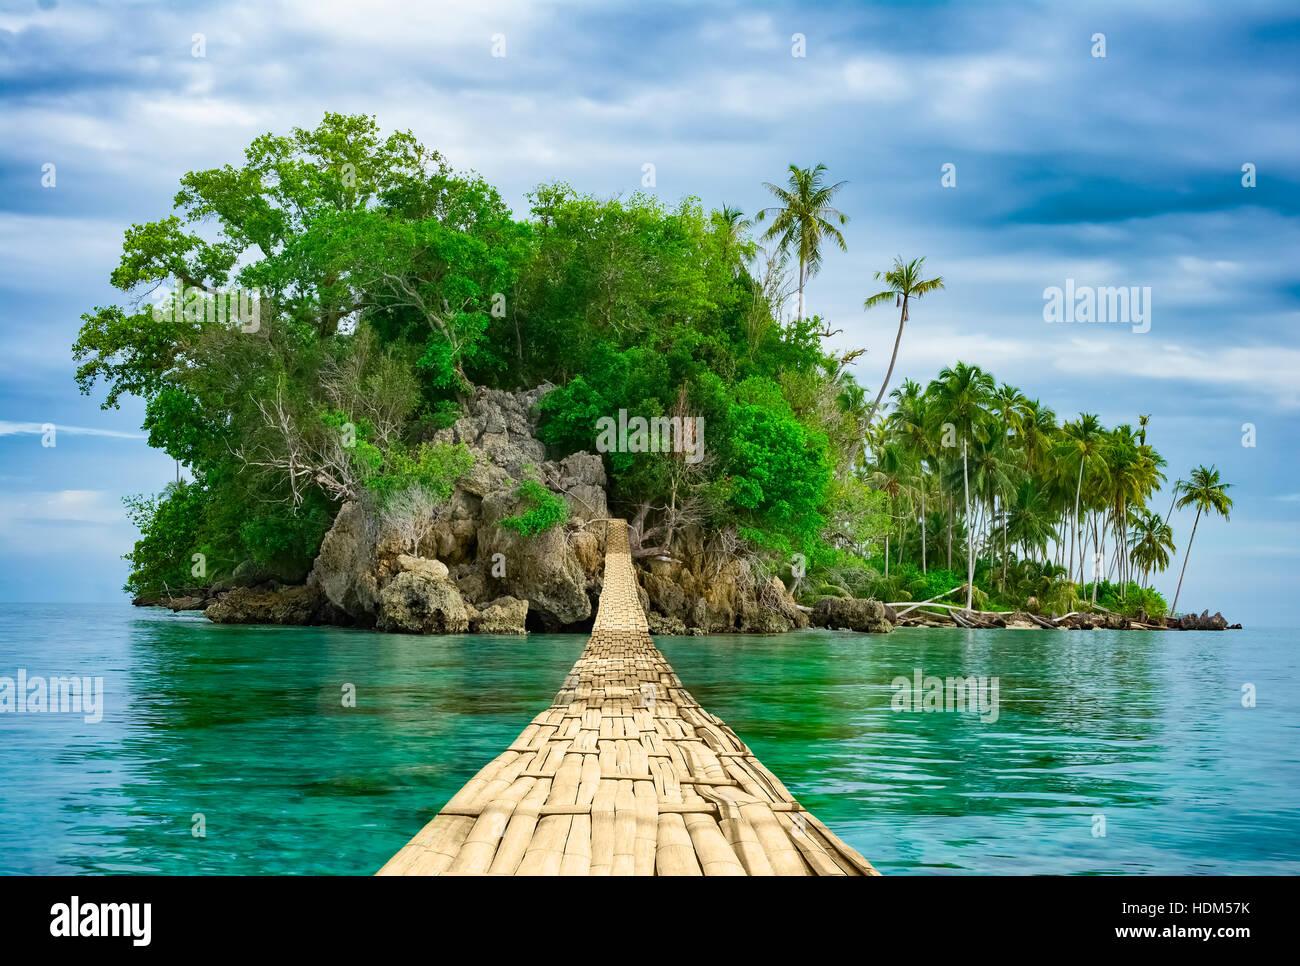 Bamboo pedestrian hanging bridge over sea to remote desert island. Beautiful tropical landscape. Travel lifestyle. Stock Photo